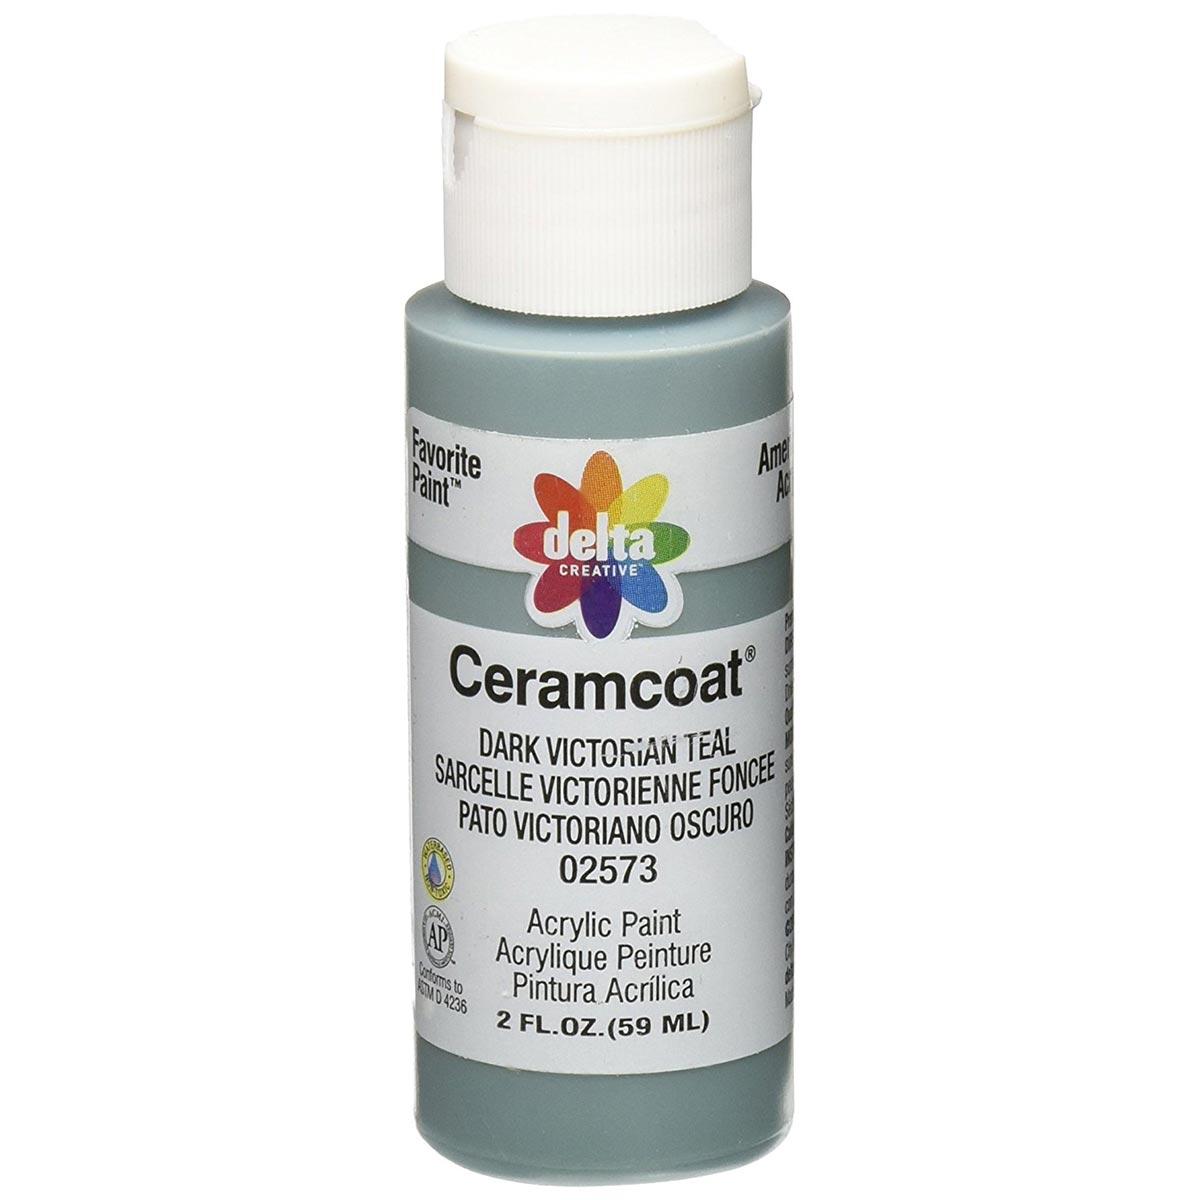 Delta Ceramcoat Acrylic Paint - Dark Victorian Teal, 2 oz. - 025730202W